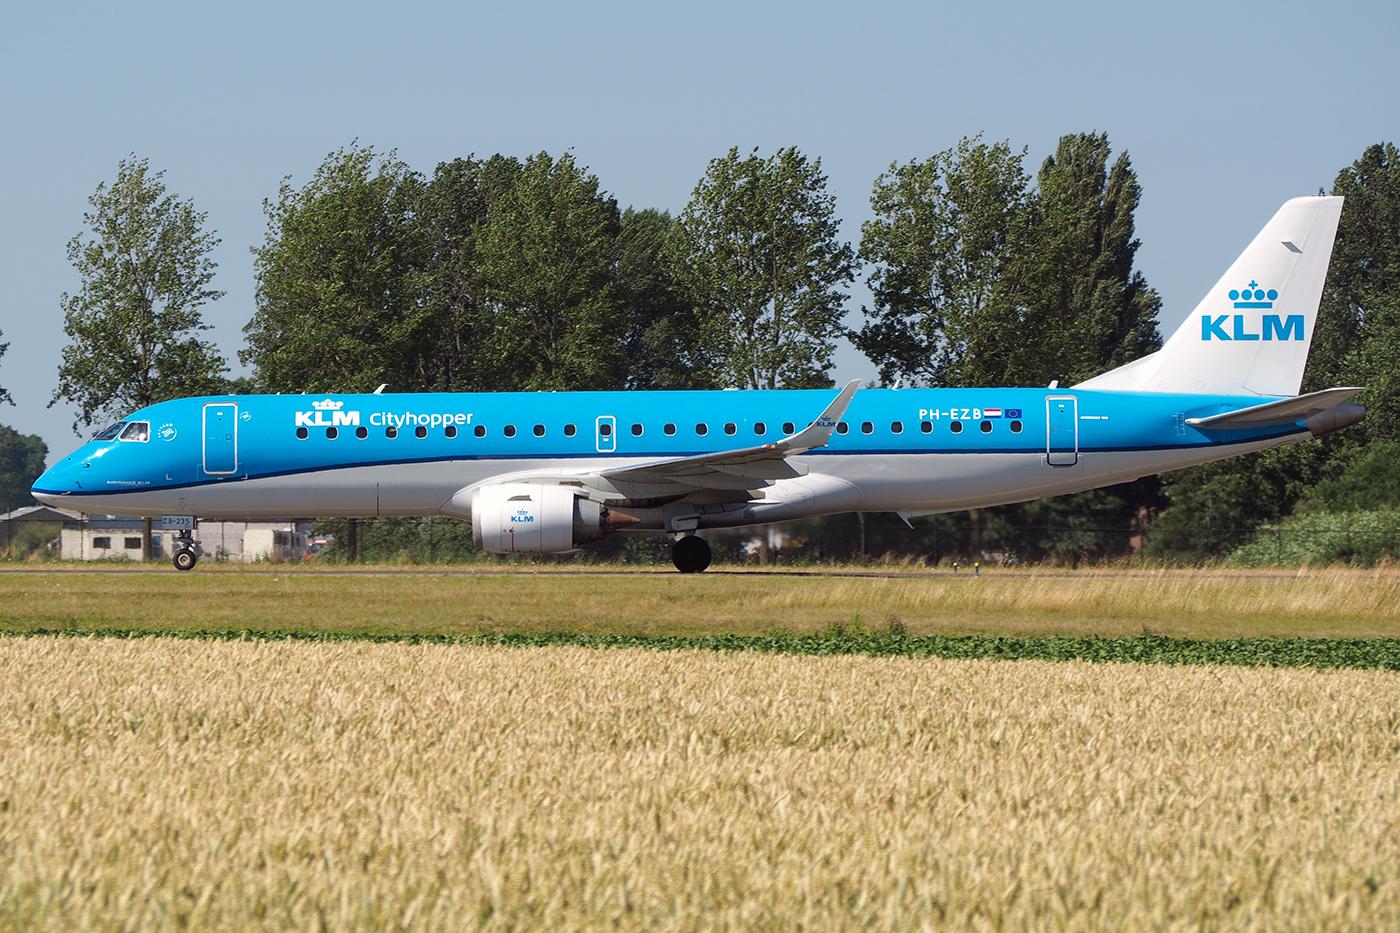 PH-EZB, KLM cityhopper, Embraer 190